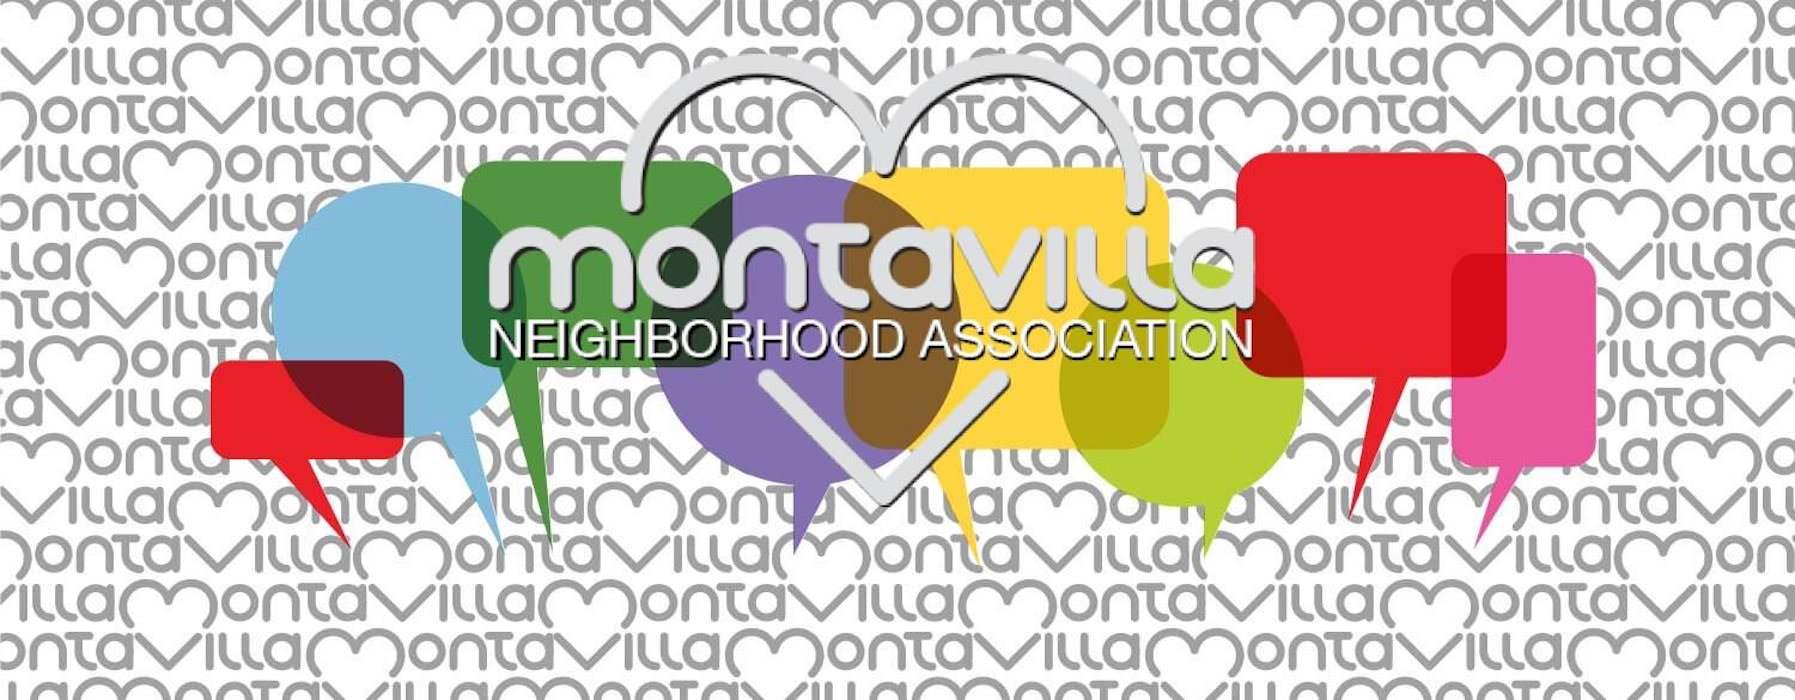 Montavilla Elections Tonight